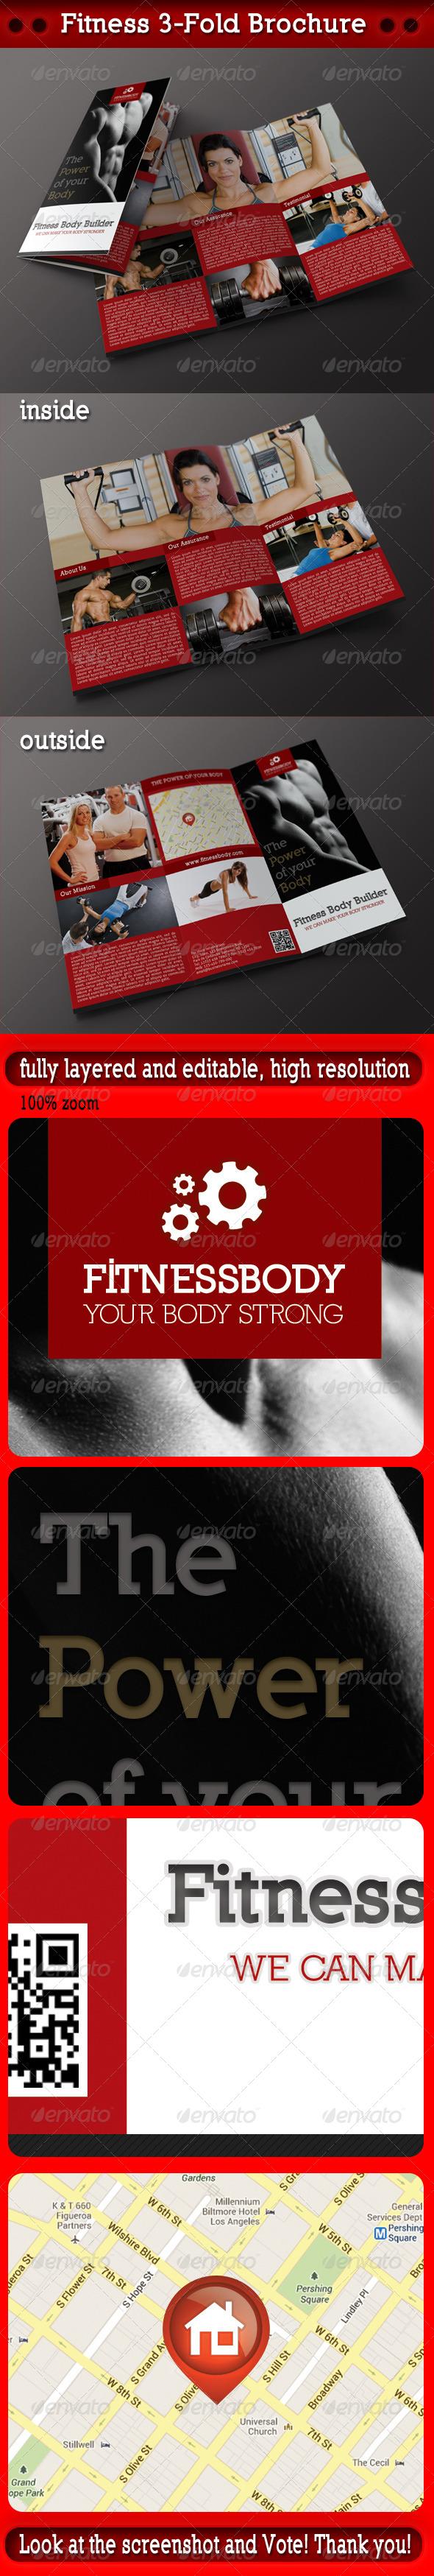 GraphicRiver Fitness 3-Fold Brochure 5028392